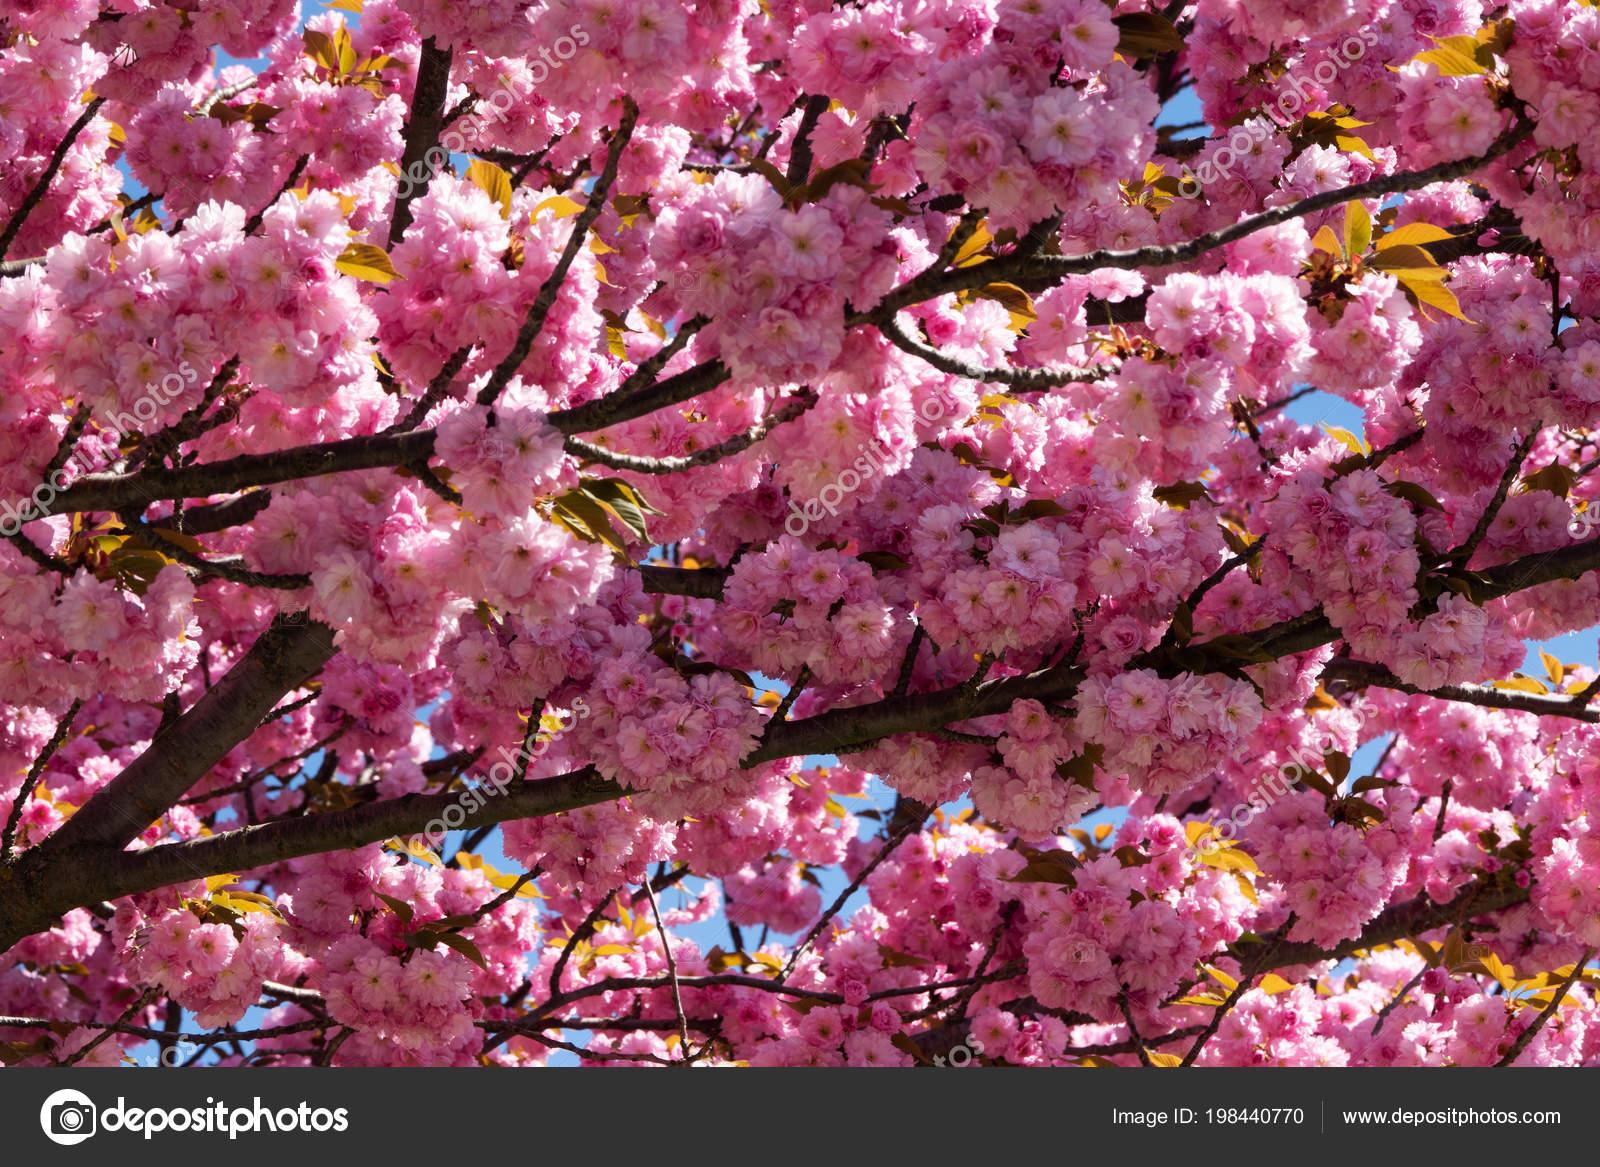 arbre a fleur rose au printemps. Black Bedroom Furniture Sets. Home Design Ideas